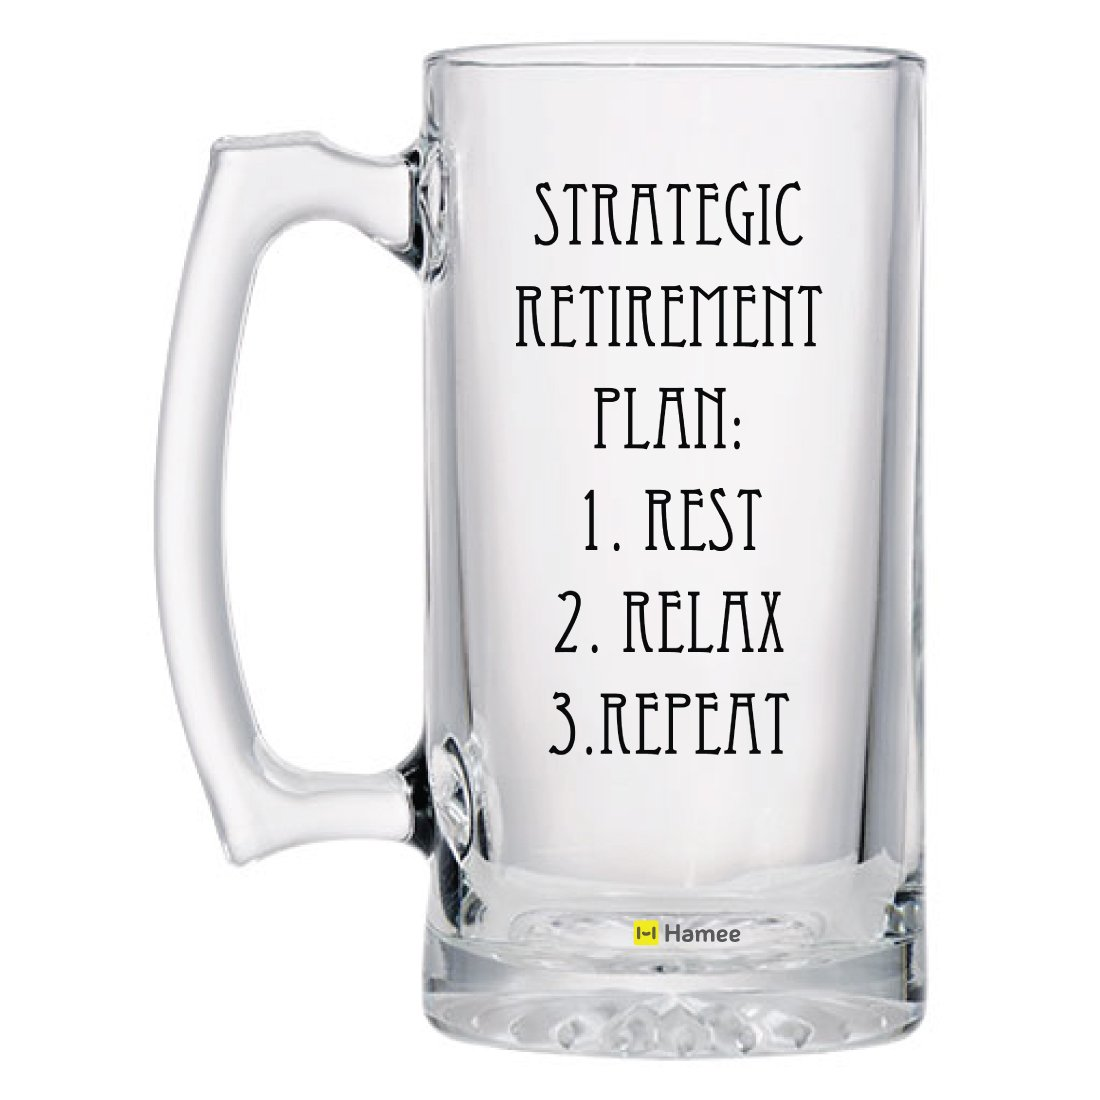 Beer Mug, Hamee Heavy Duty Premium 16.9 oz Beer Glass/Beer Mug with Handle, Gift for Retirement, Gift for Dad, Gift for Uncle - Retirement Plan